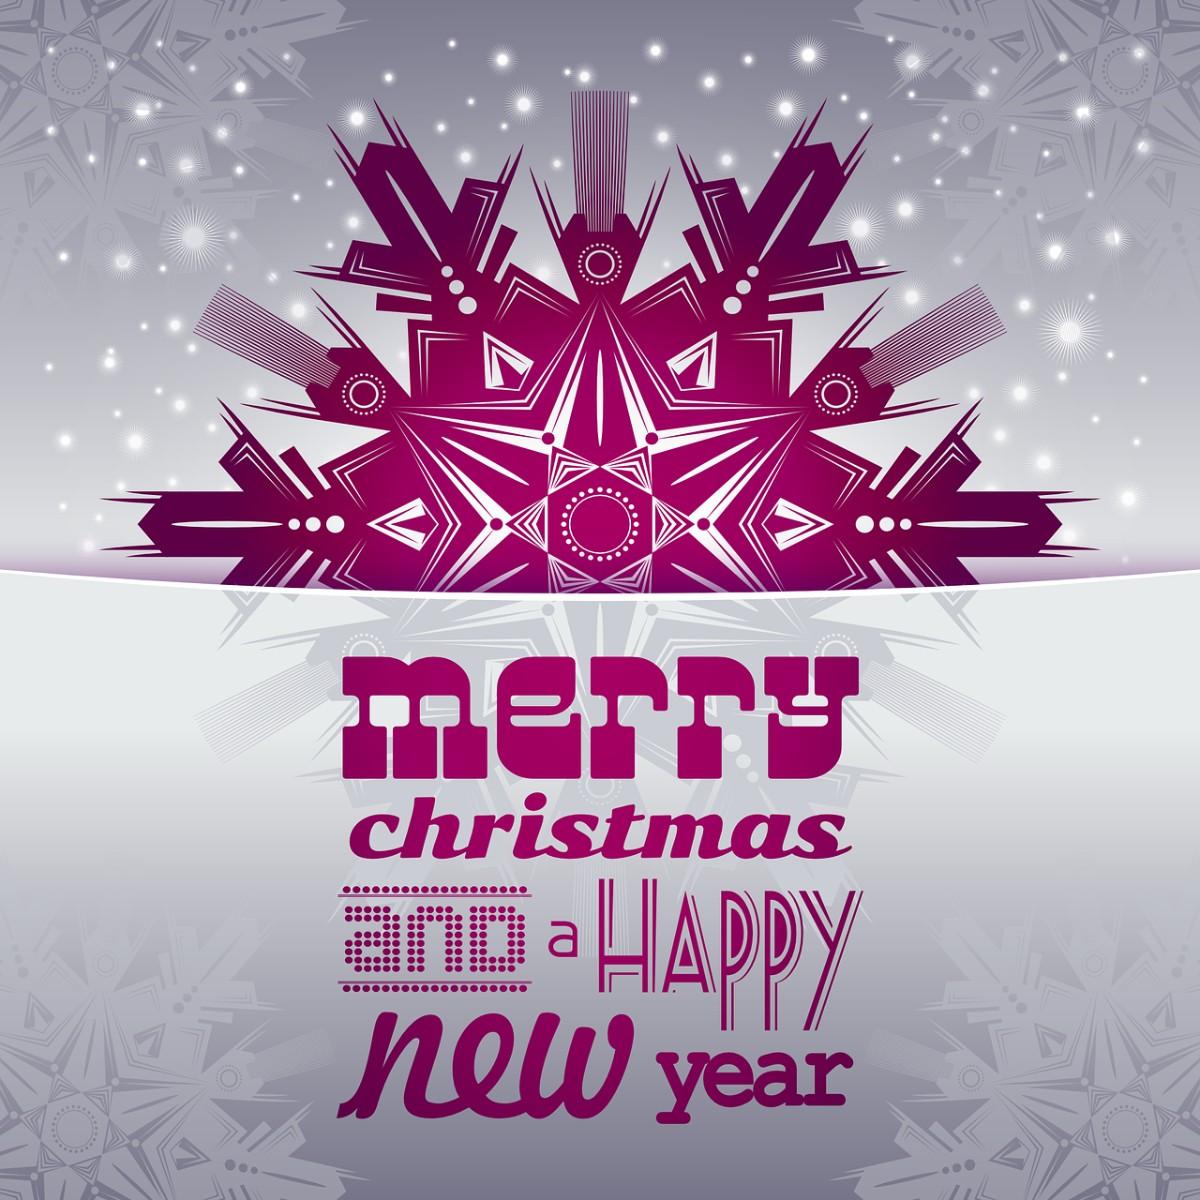 Merry Christmas and NY